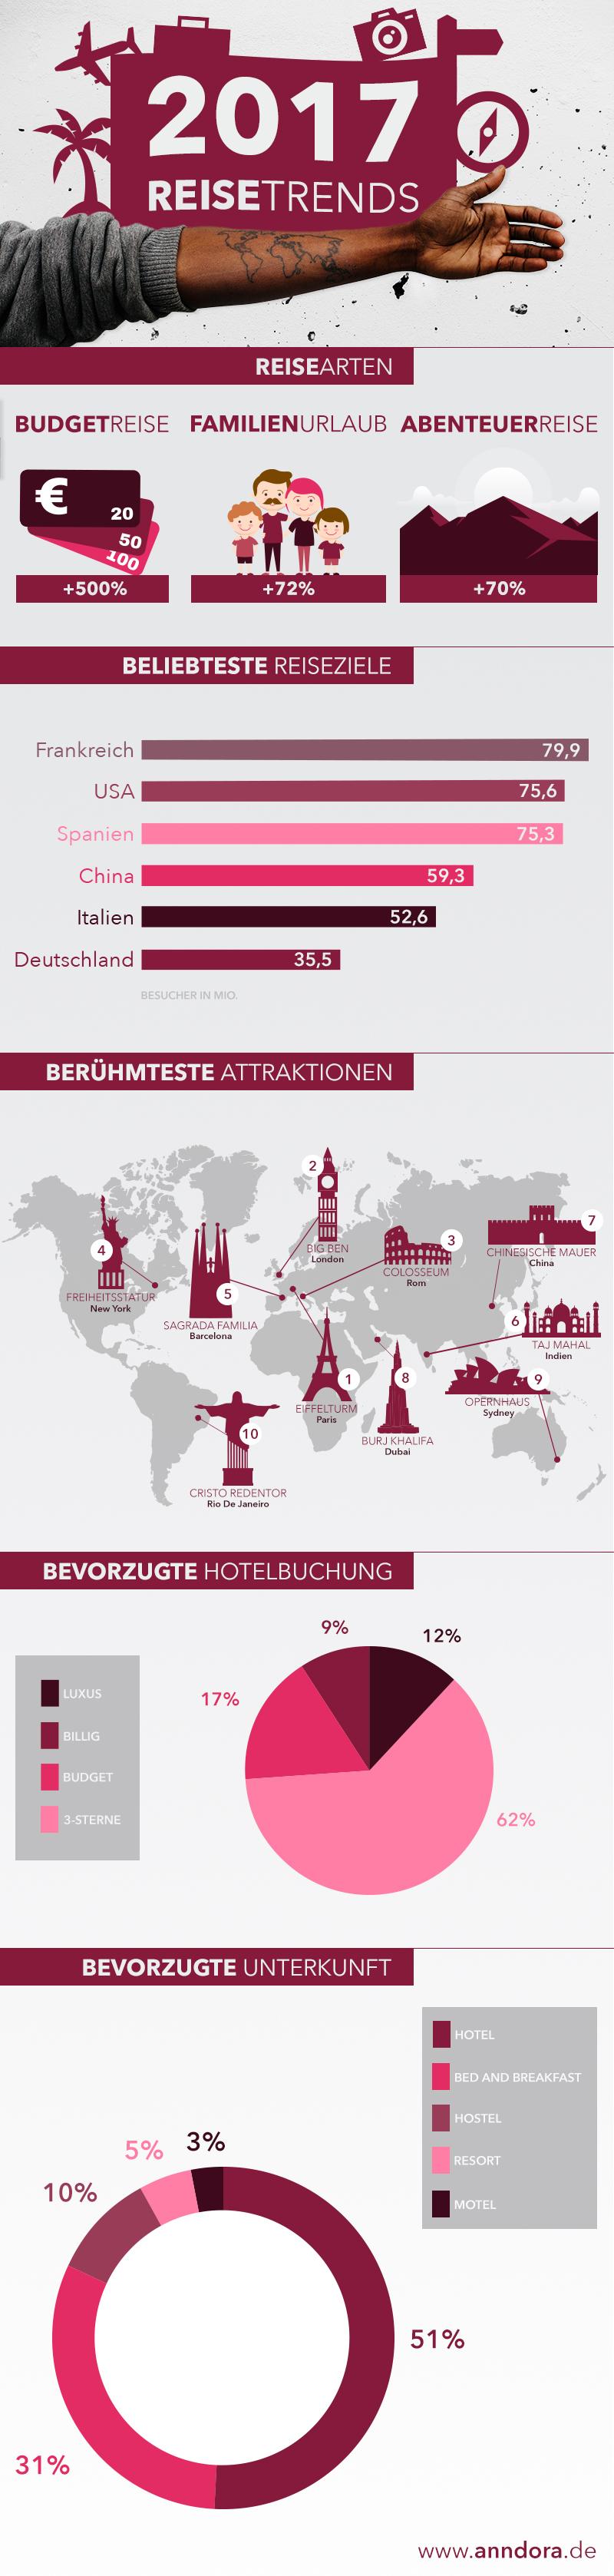 Reisetrends 2017 - anndora.de